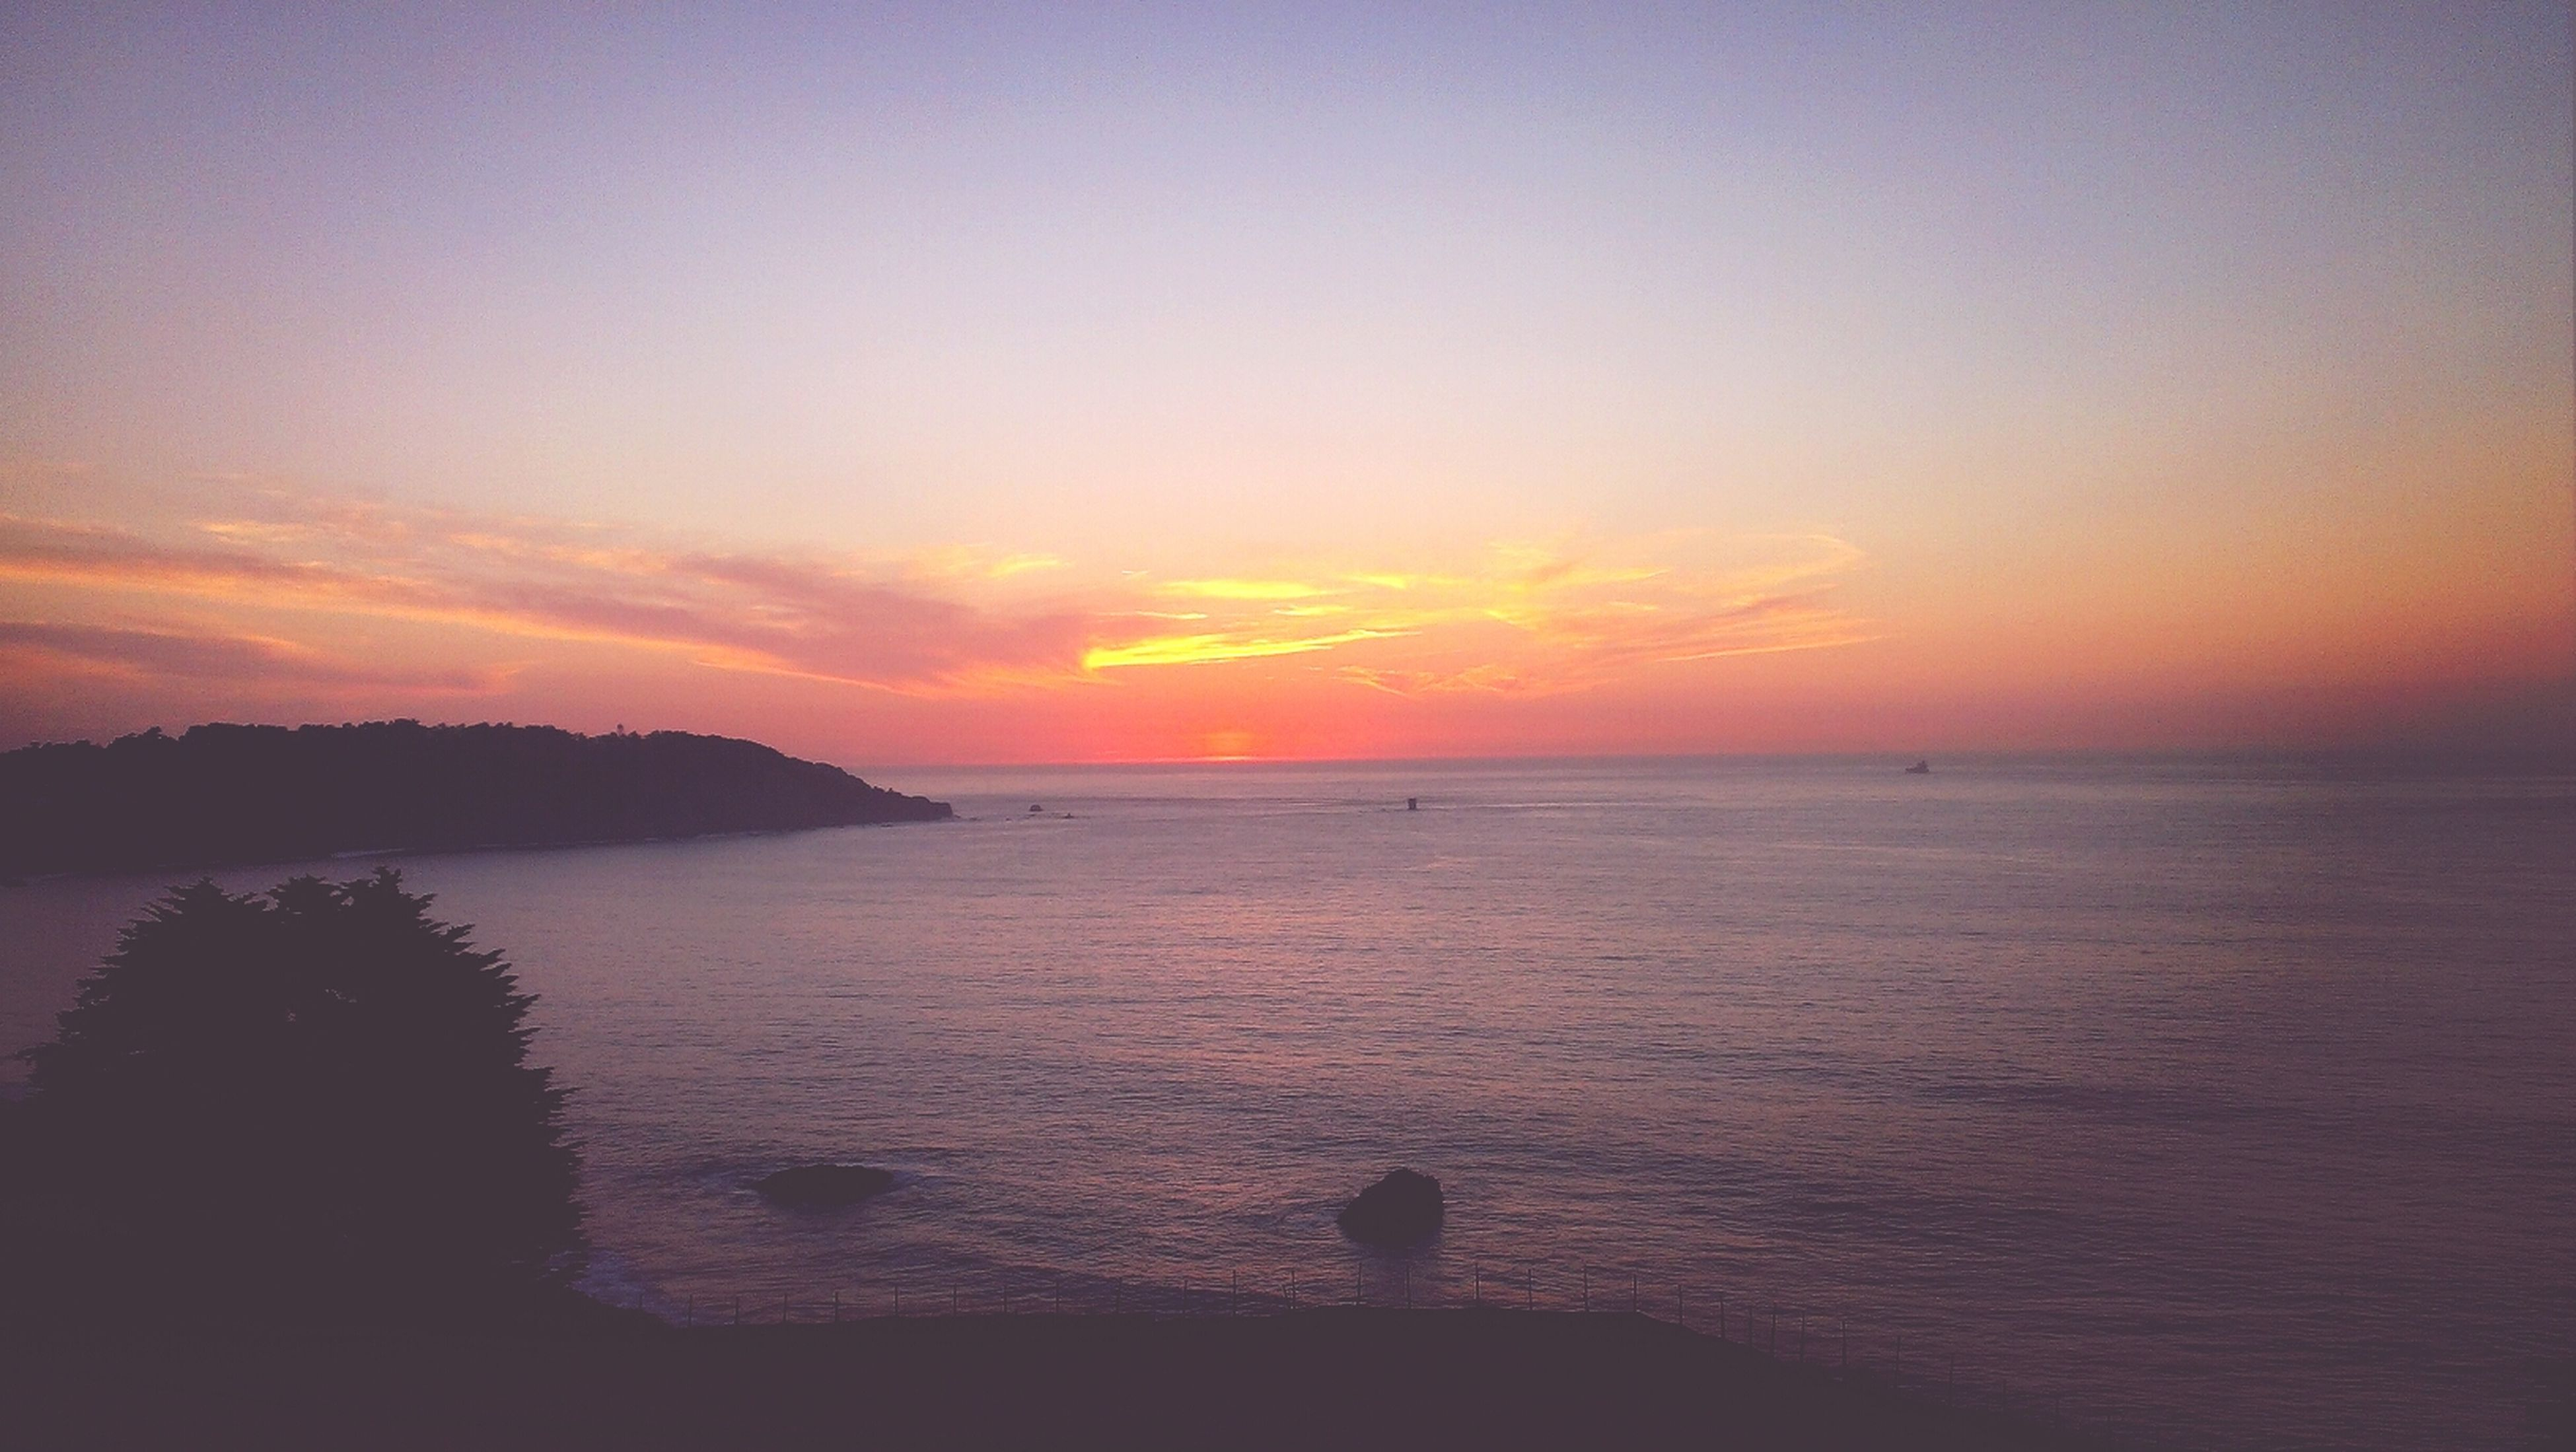 sunset, sea, water, scenics, tranquil scene, horizon over water, tranquility, beauty in nature, silhouette, orange color, sky, idyllic, nature, beach, shore, remote, dusk, outdoors, calm, non-urban scene